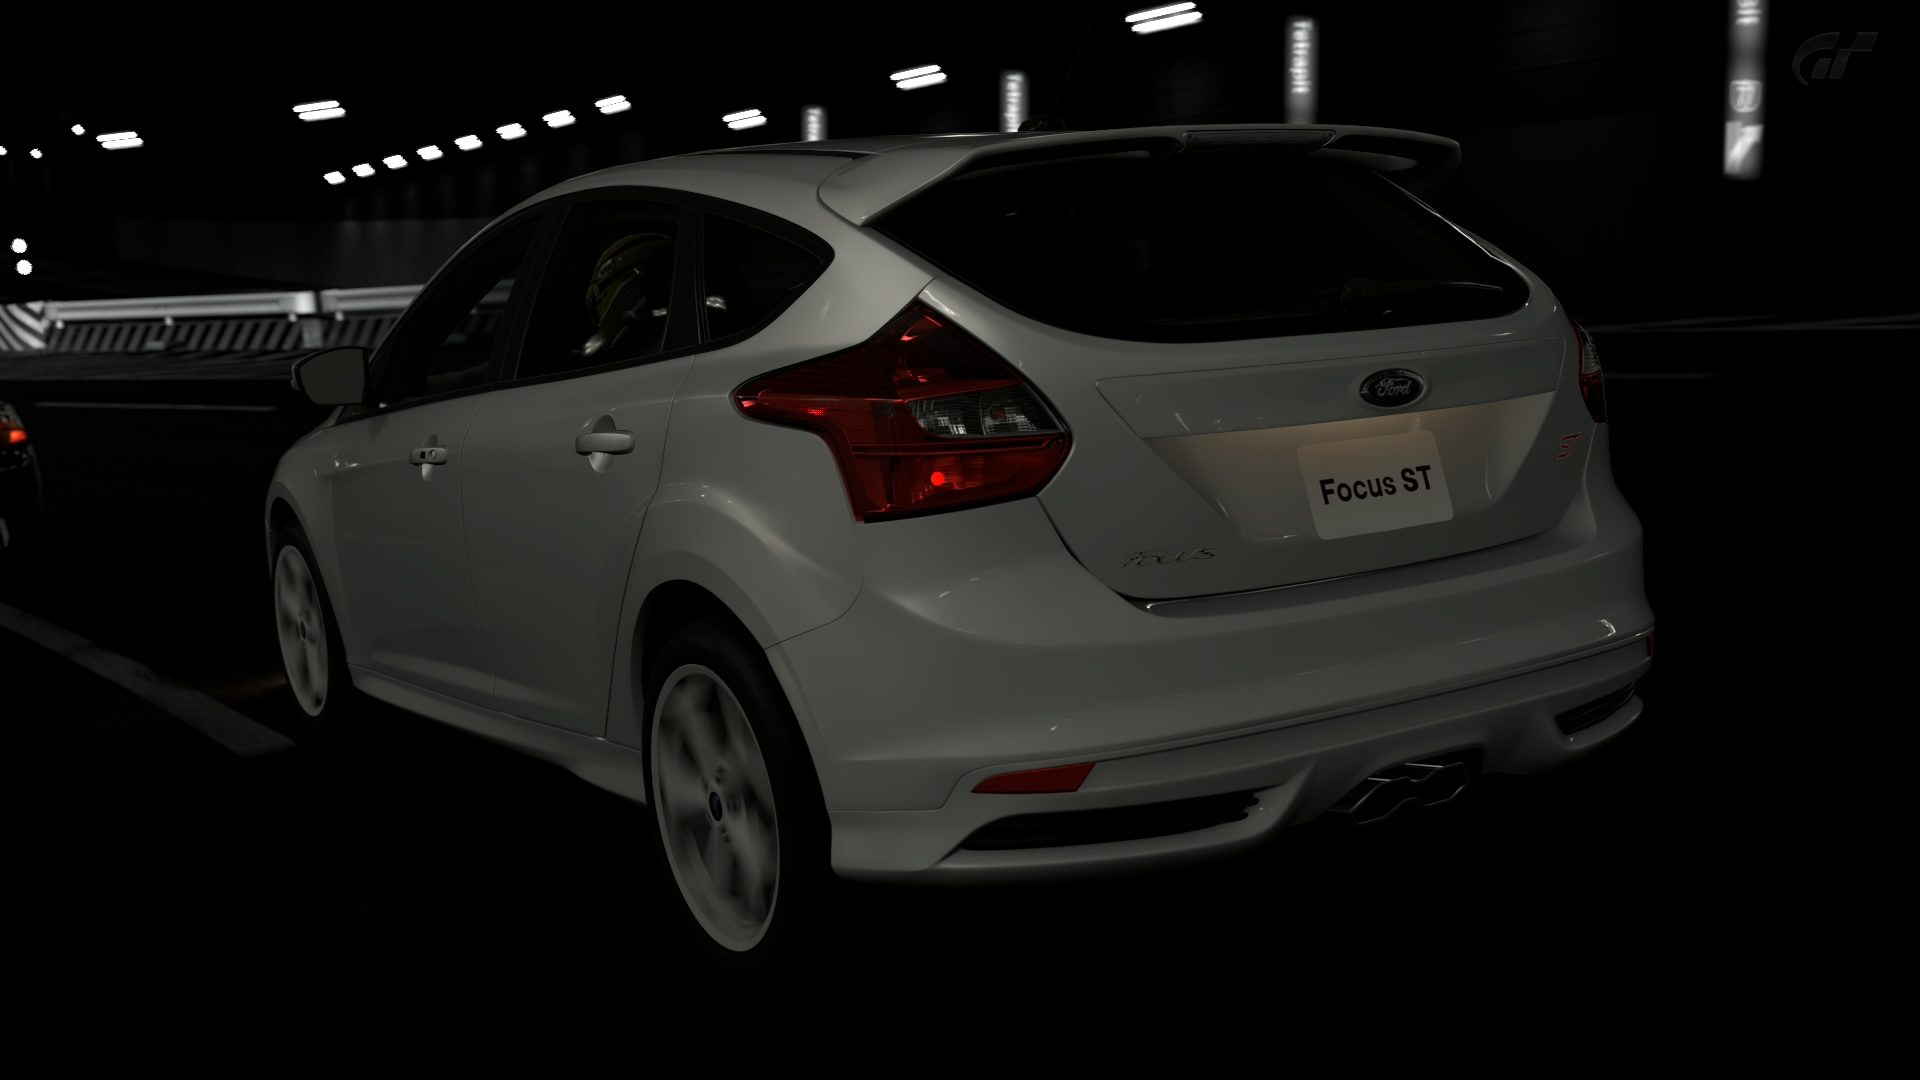 2013 Ford Focus ST - #001.jpg